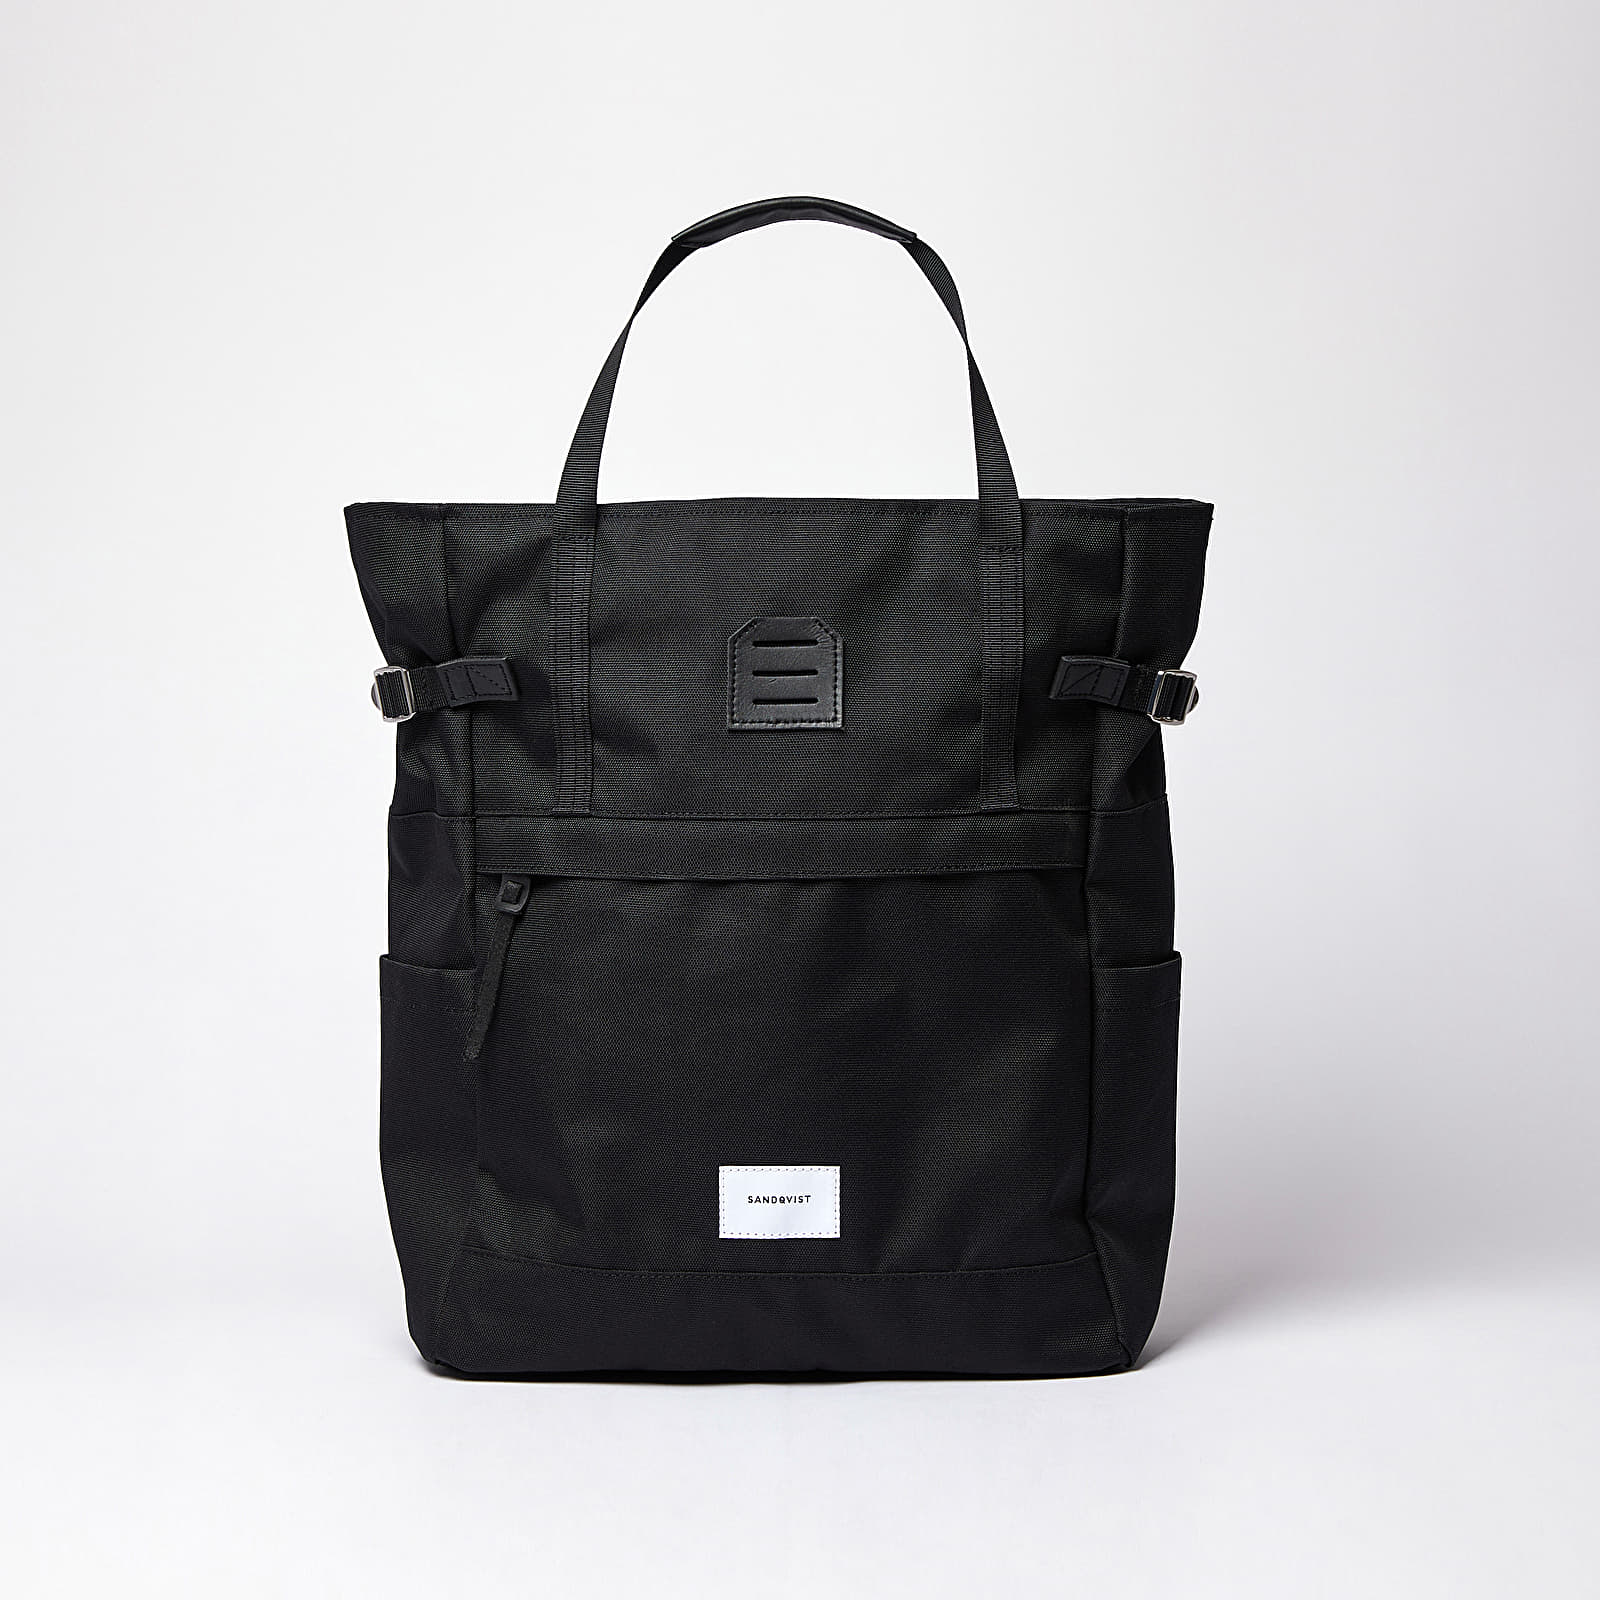 Backpacks SANDQVIST Roger Backpack Black